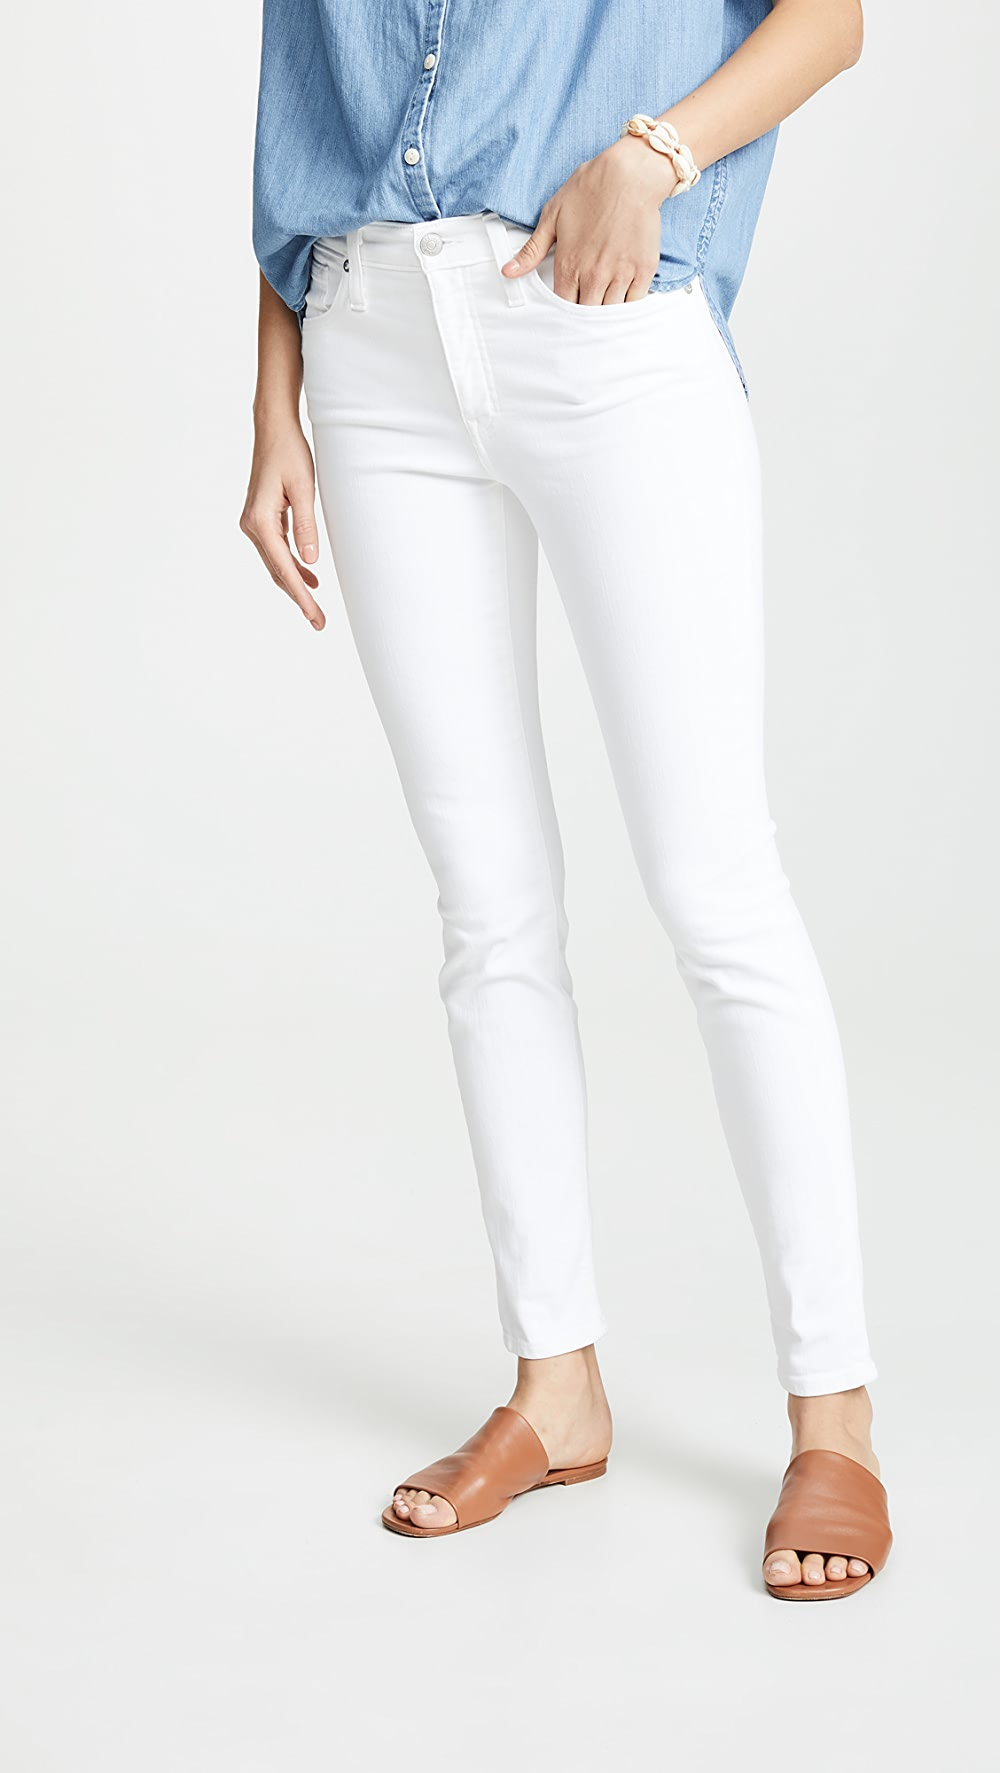 100% True Madewell - High Rise Skinny Jeans 100% Original